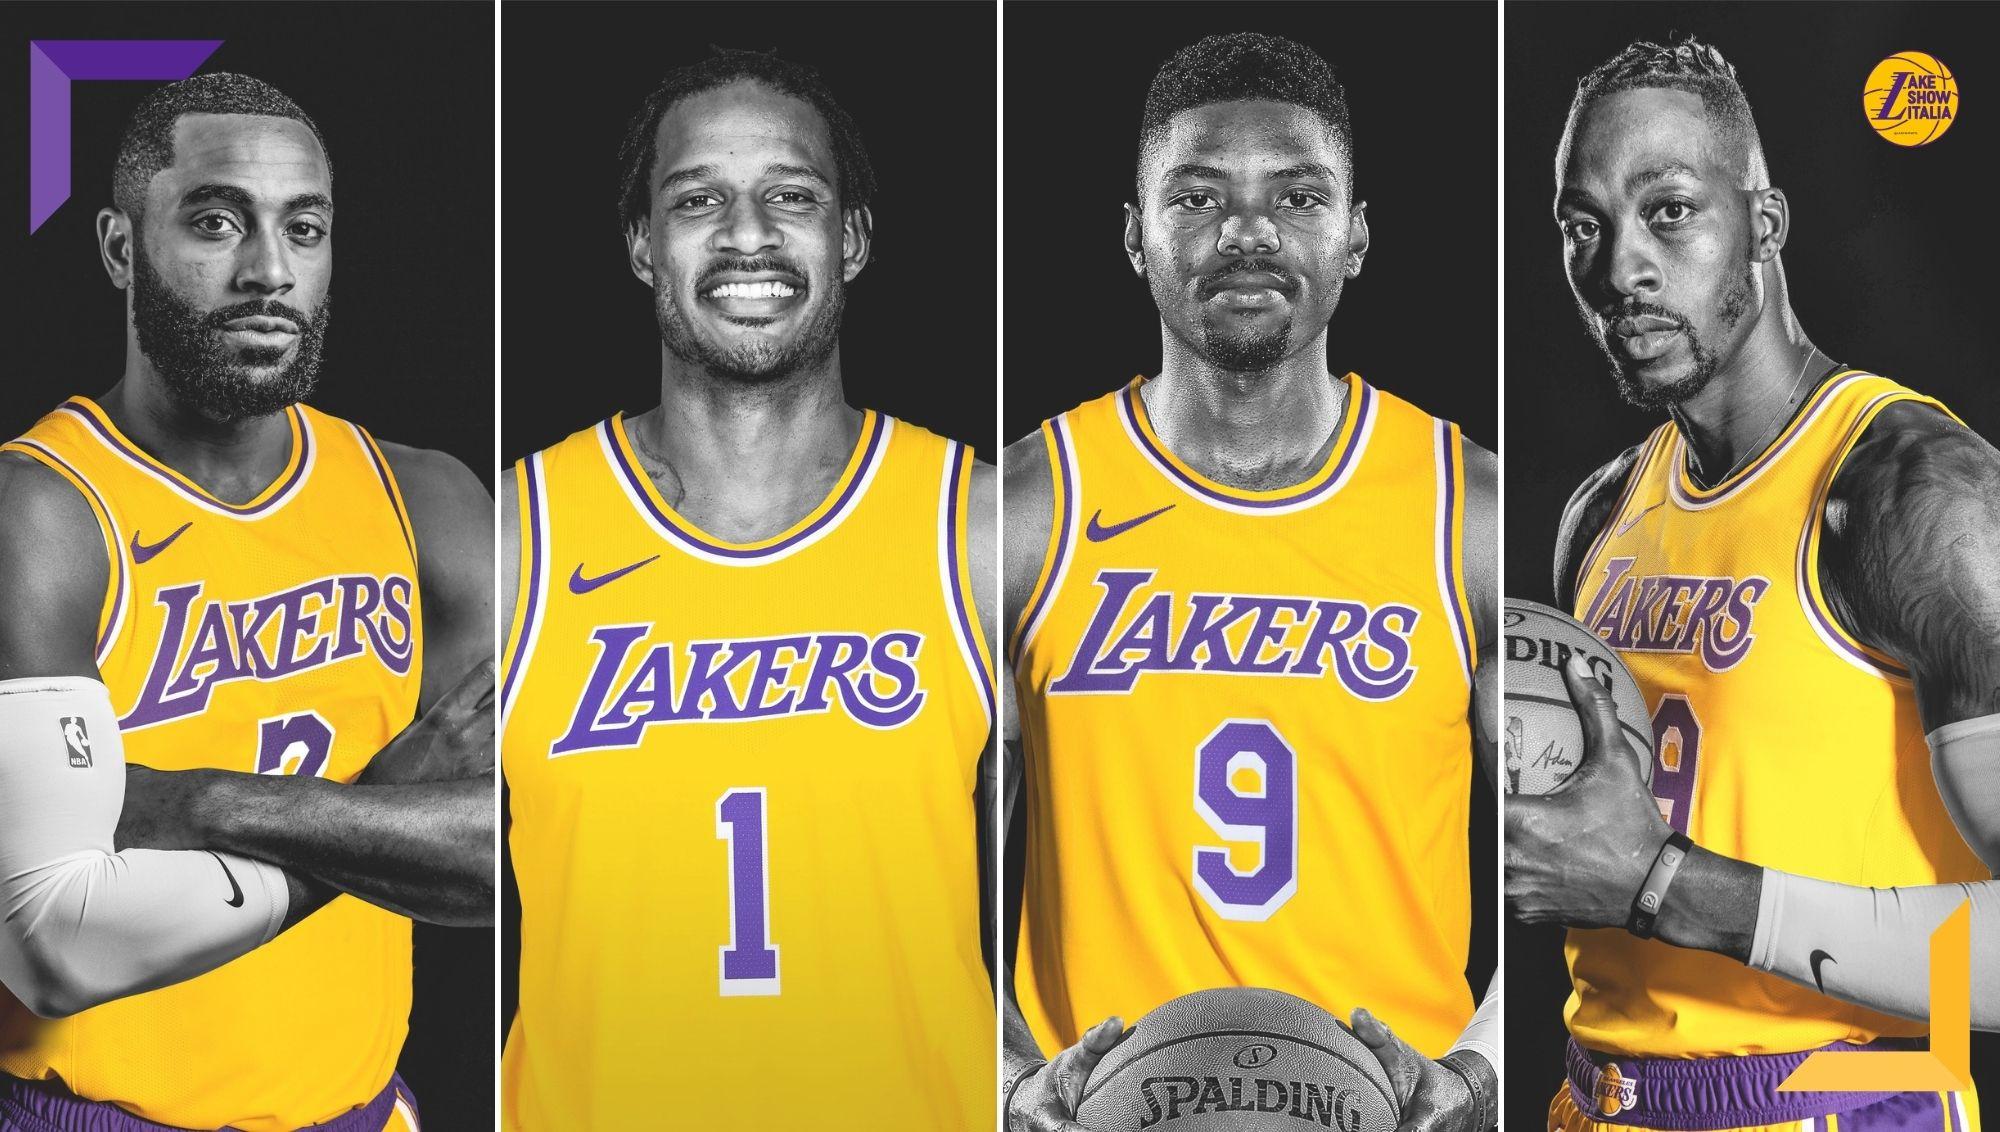 Il General Manager Rob Pelinka ha annunciato i ritorni di Trevor Ariza, Kent Bazemore, Wayne Ellington e Dwight Howard ai Los Angeles Lakers.